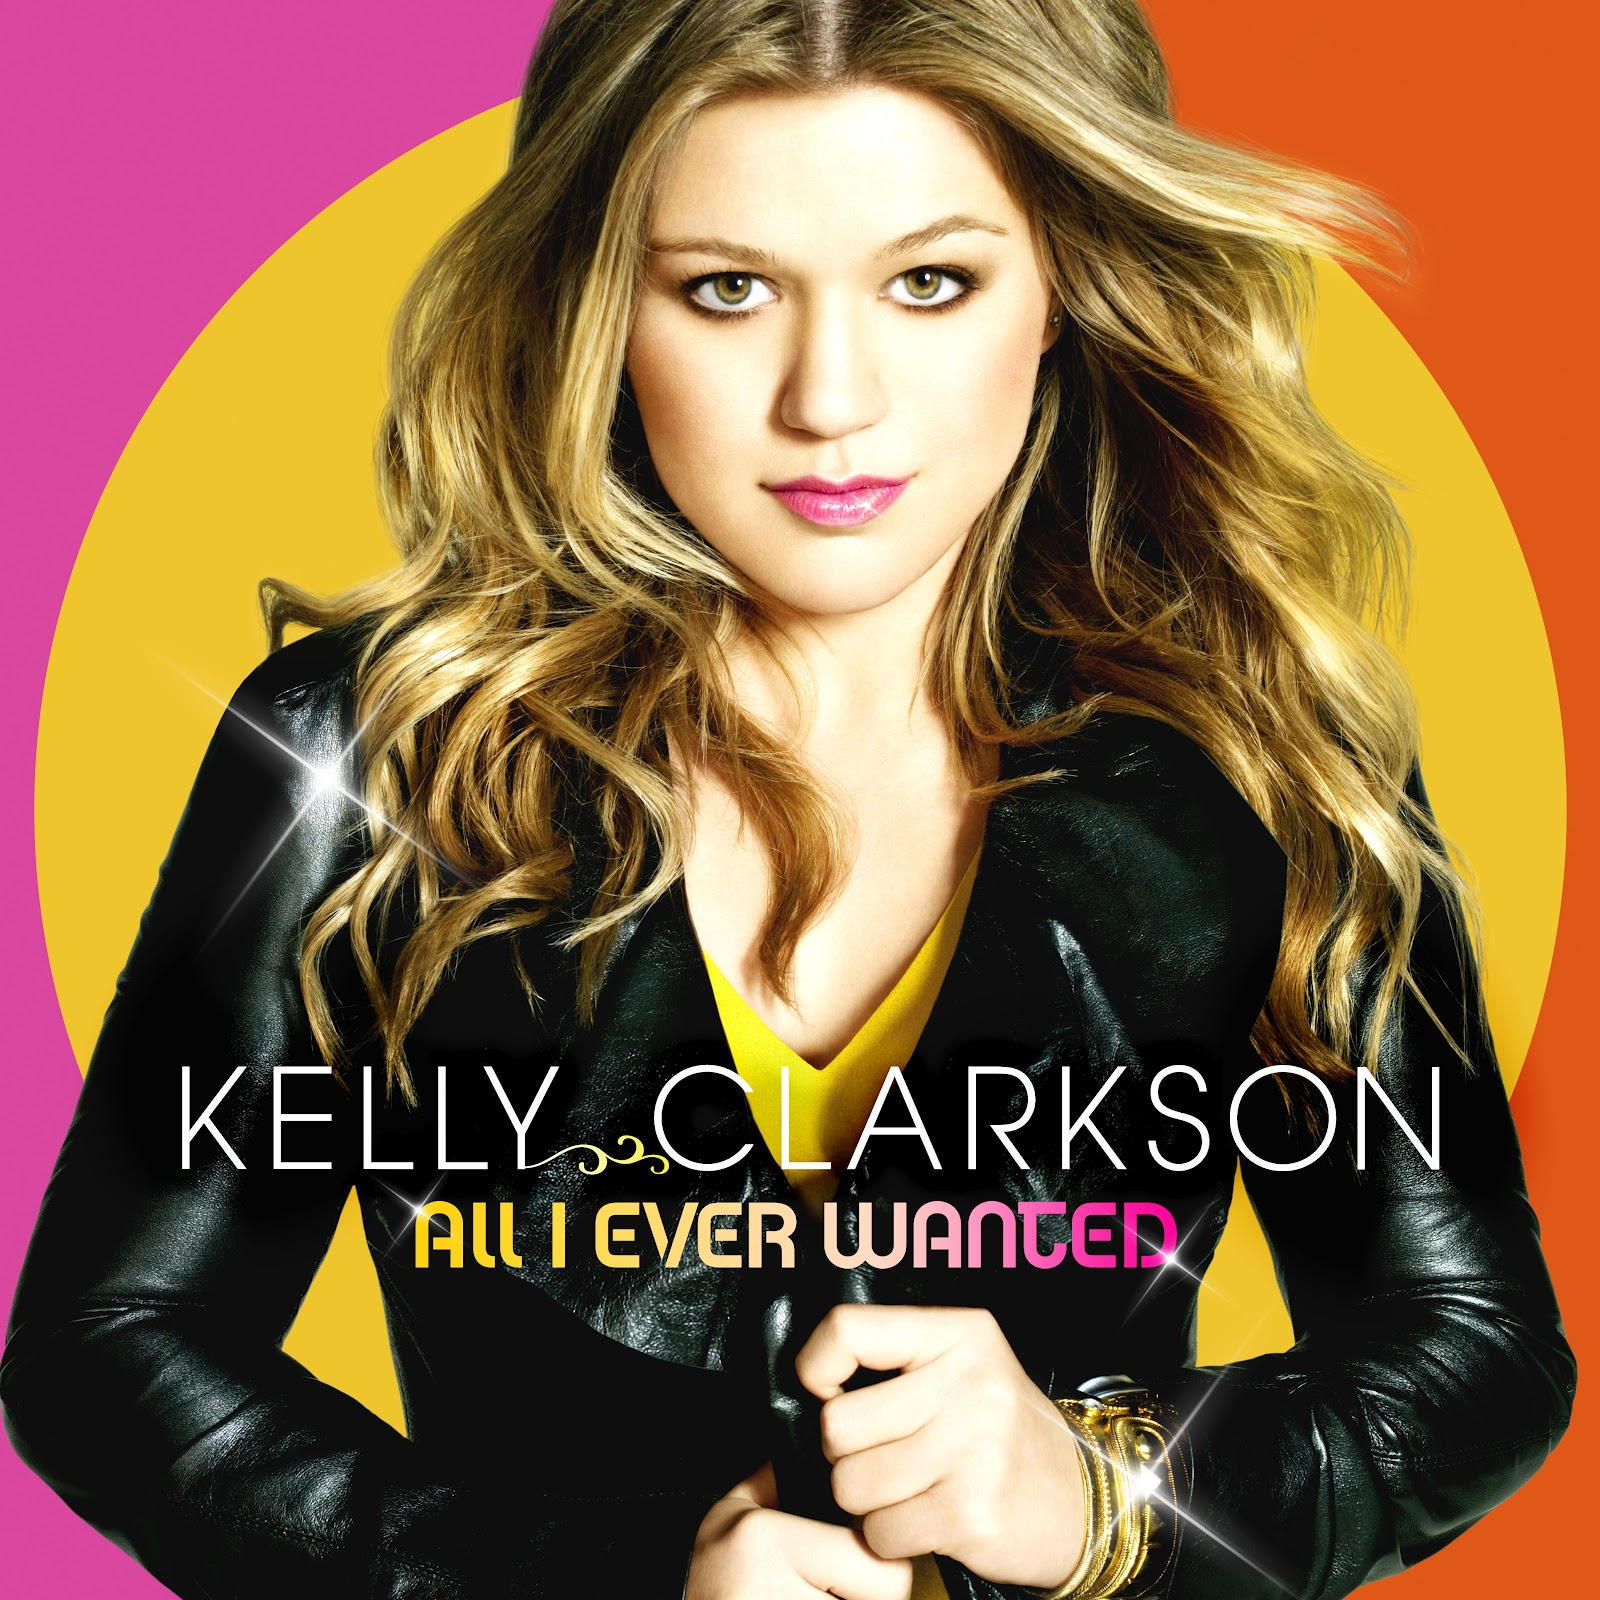 http://3.bp.blogspot.com/-pqDdcXA767w/T71dx5C8yZI/AAAAAAAAA8c/ahkNK6lOS60/s1600/KellyClarkson_AIEW_Cover.jpg